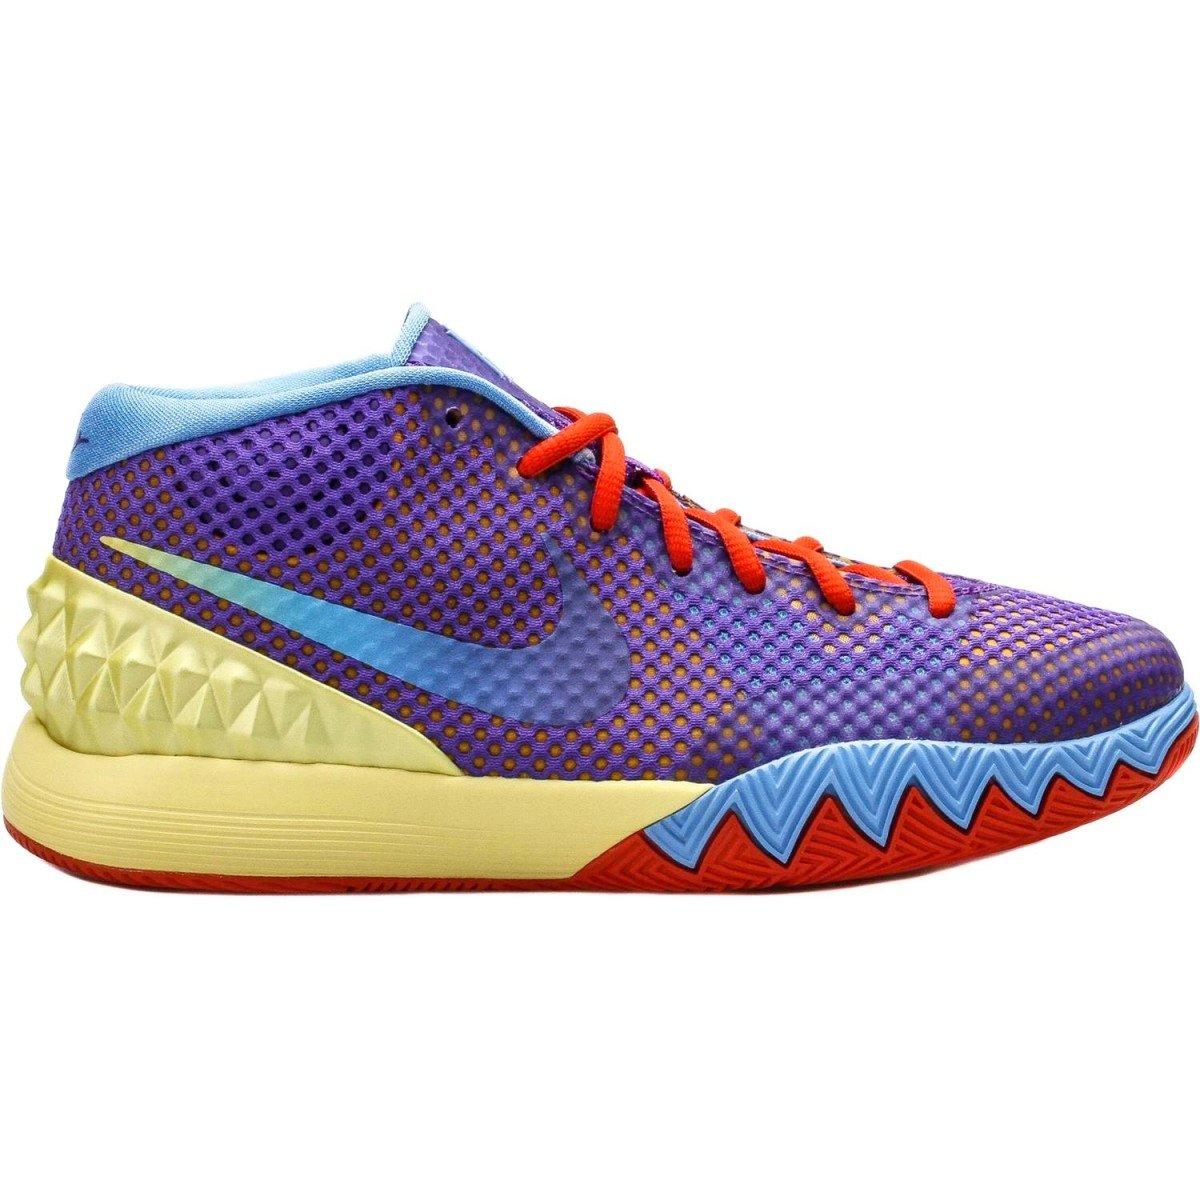 f014078b416 Galleon - Nike Boys Kyrie 1 Easter Egg Basketball Shoes Lemon Frost Hyper  Grape 7Y